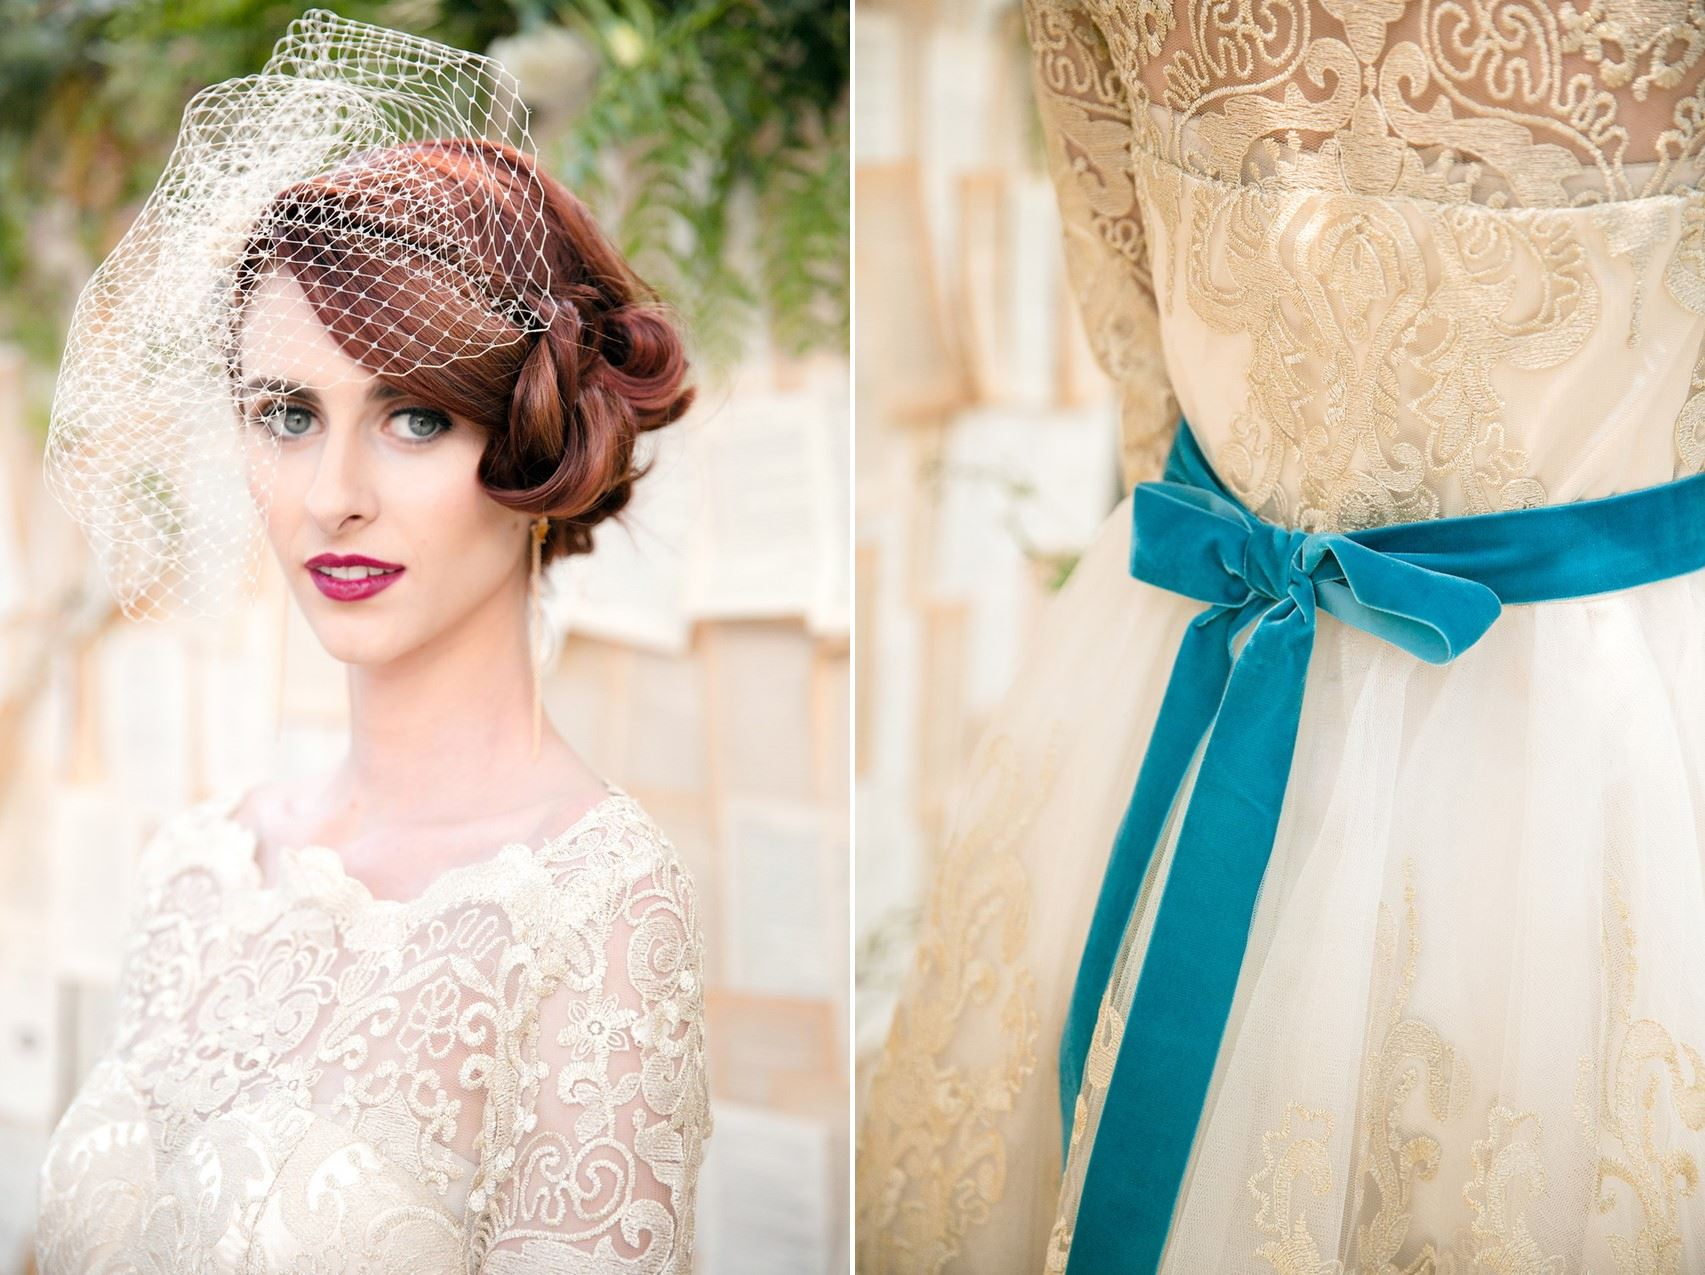 Vintage Bride - Mid-Century Vintage Wedding Shoot Inspired by Penguin Books